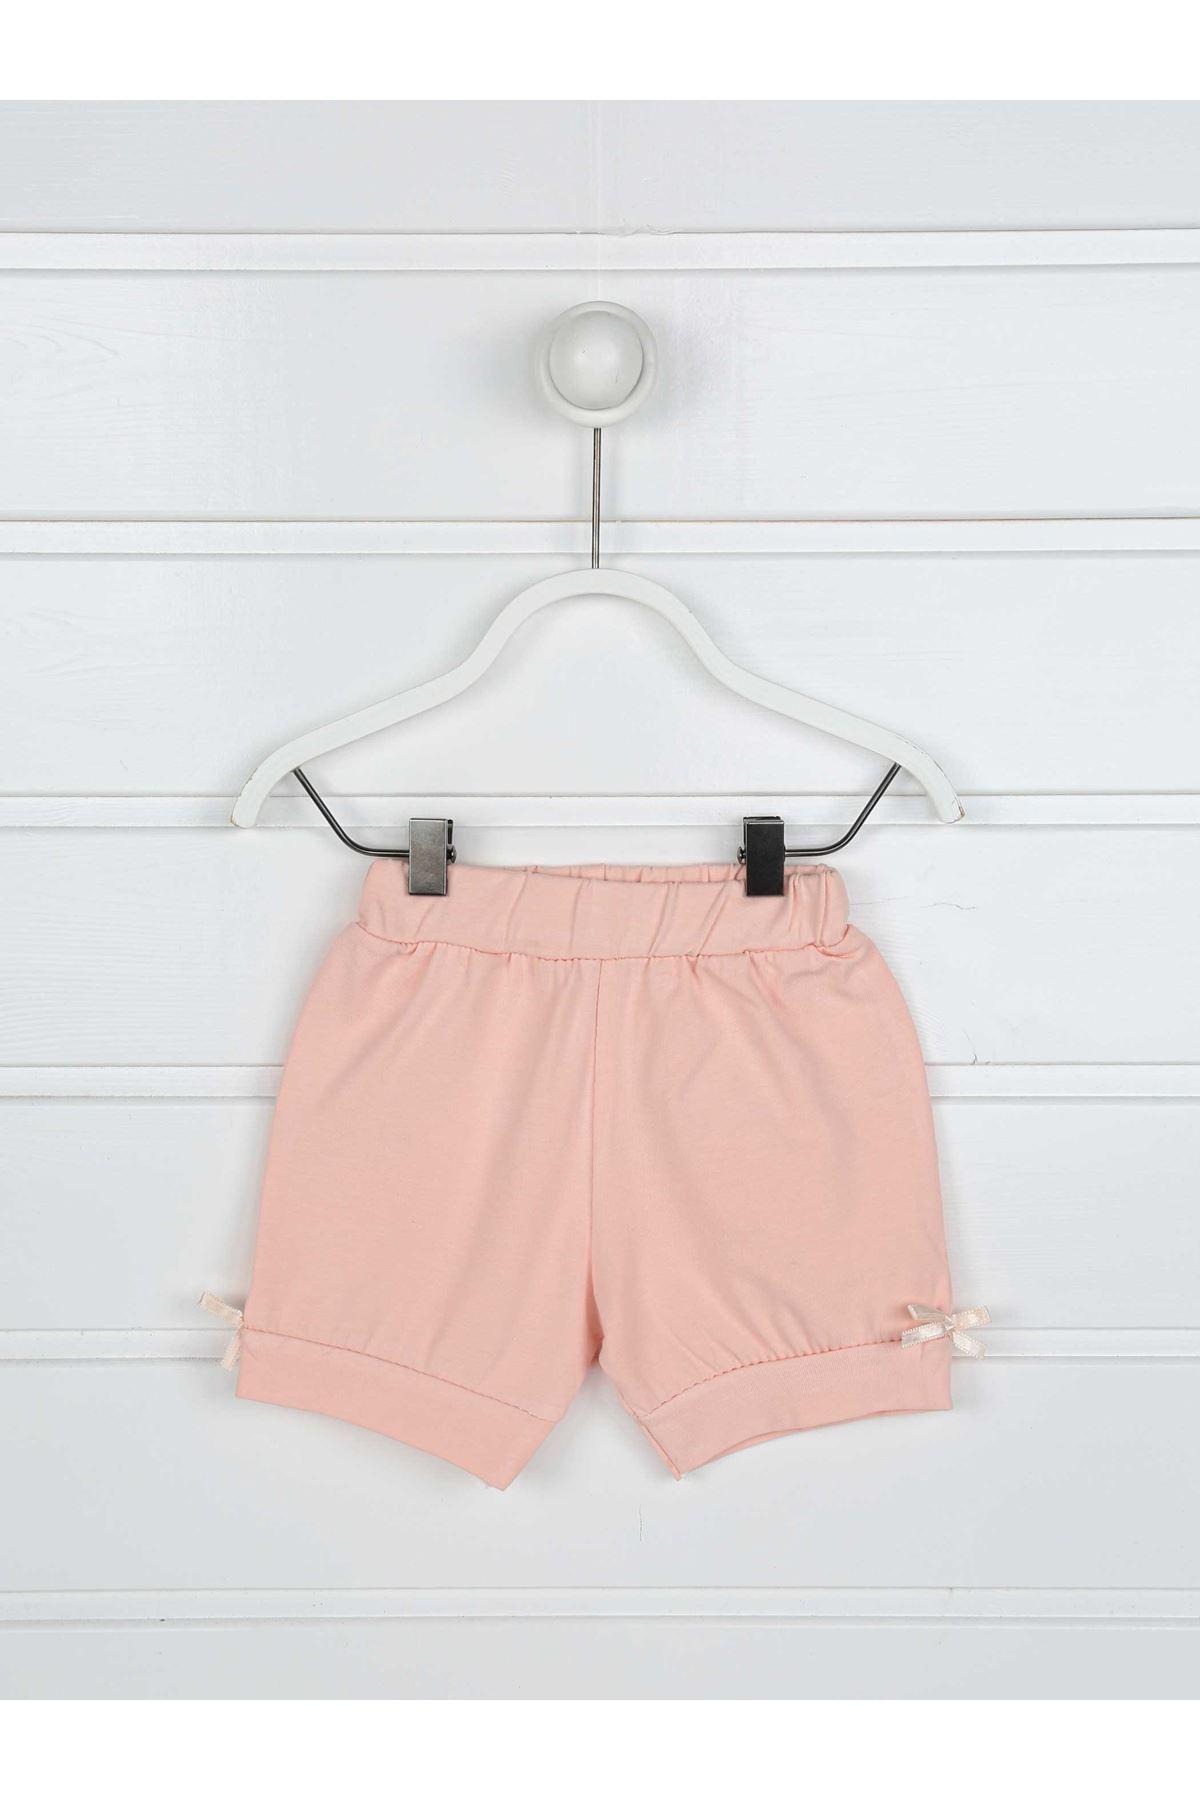 Powder Pink Summer baby girl set bottom tights t-shirt 2 pieces bottom top babies cotton seasonal models